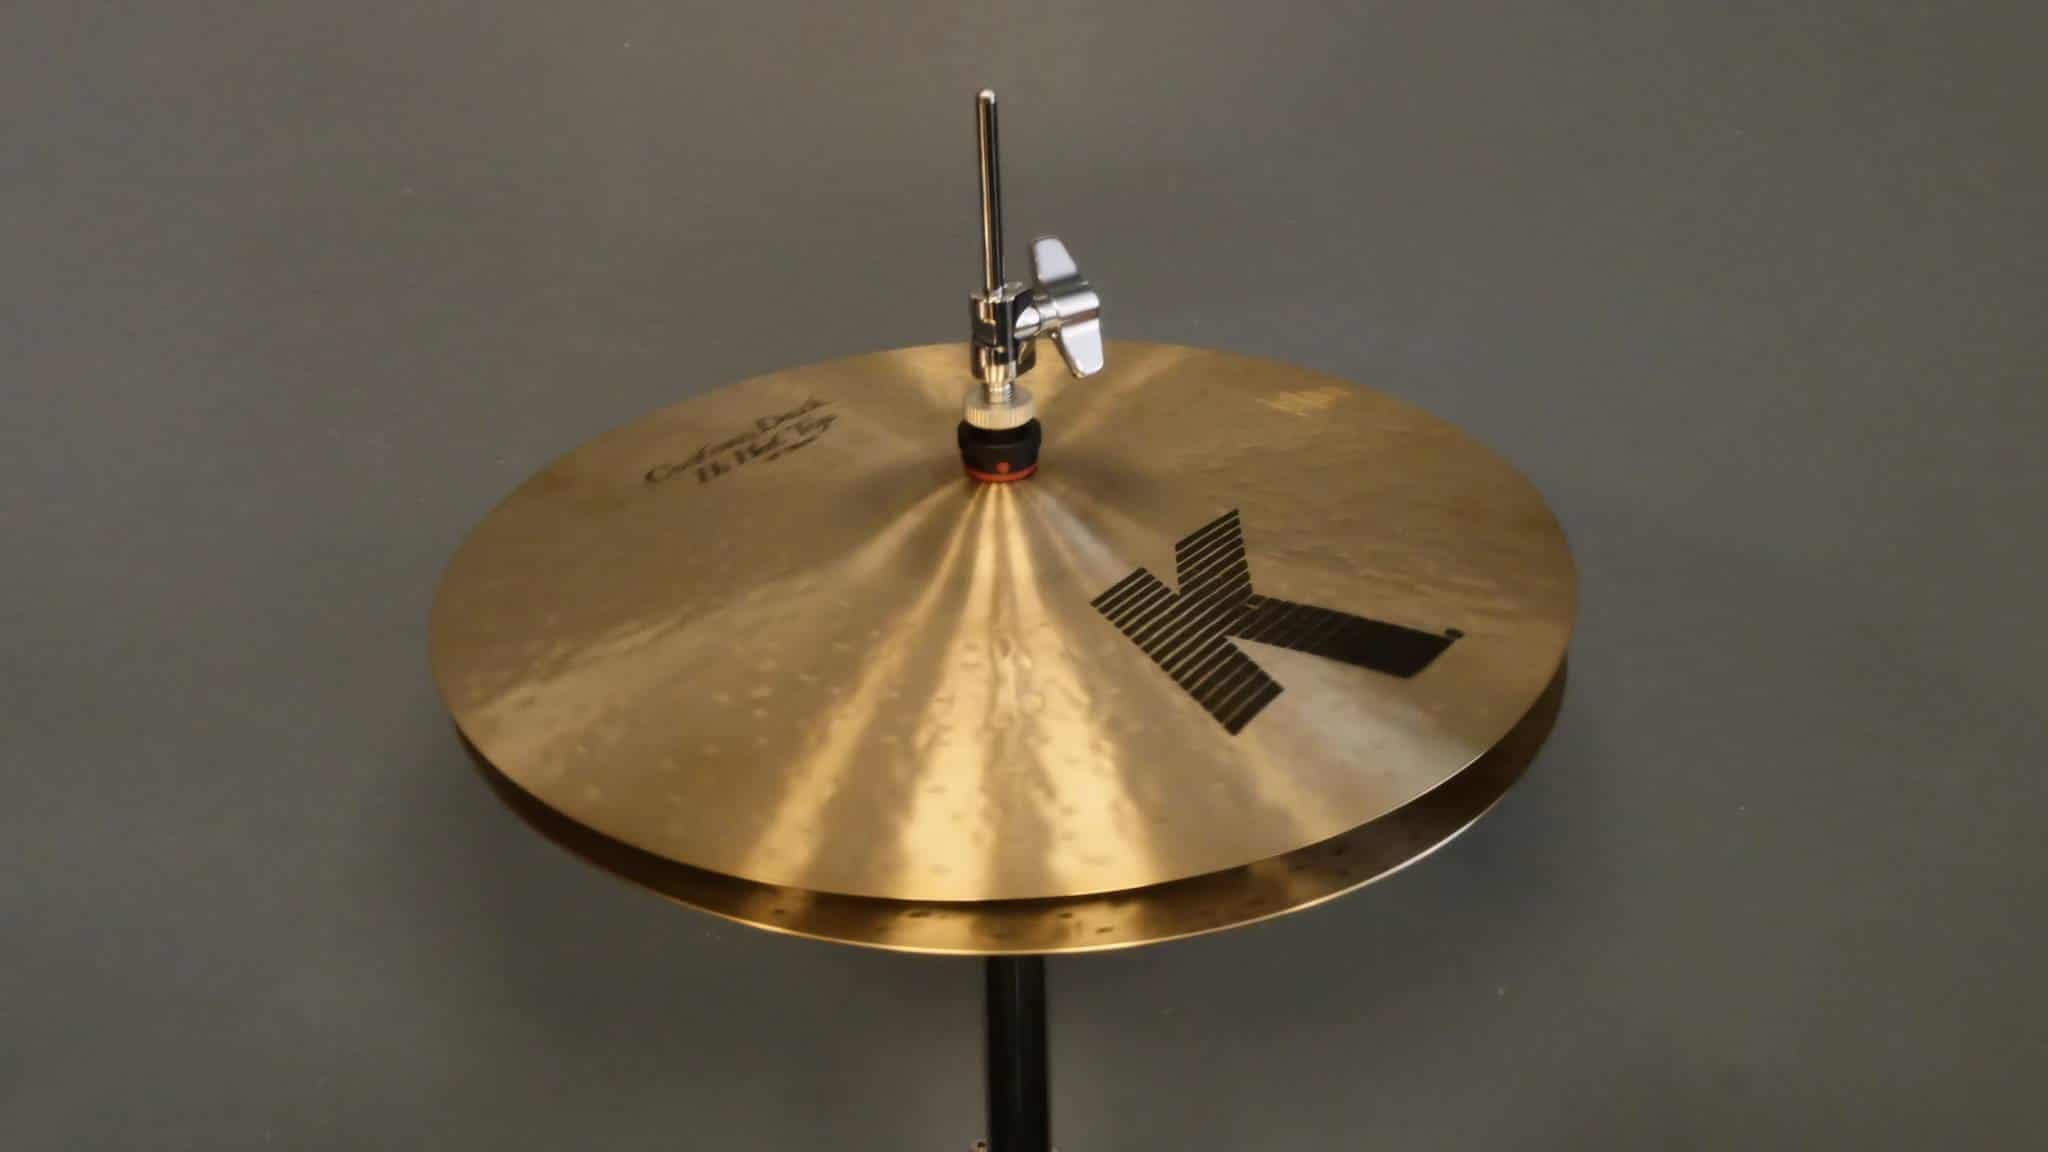 Zildjian K-custom hi-hat